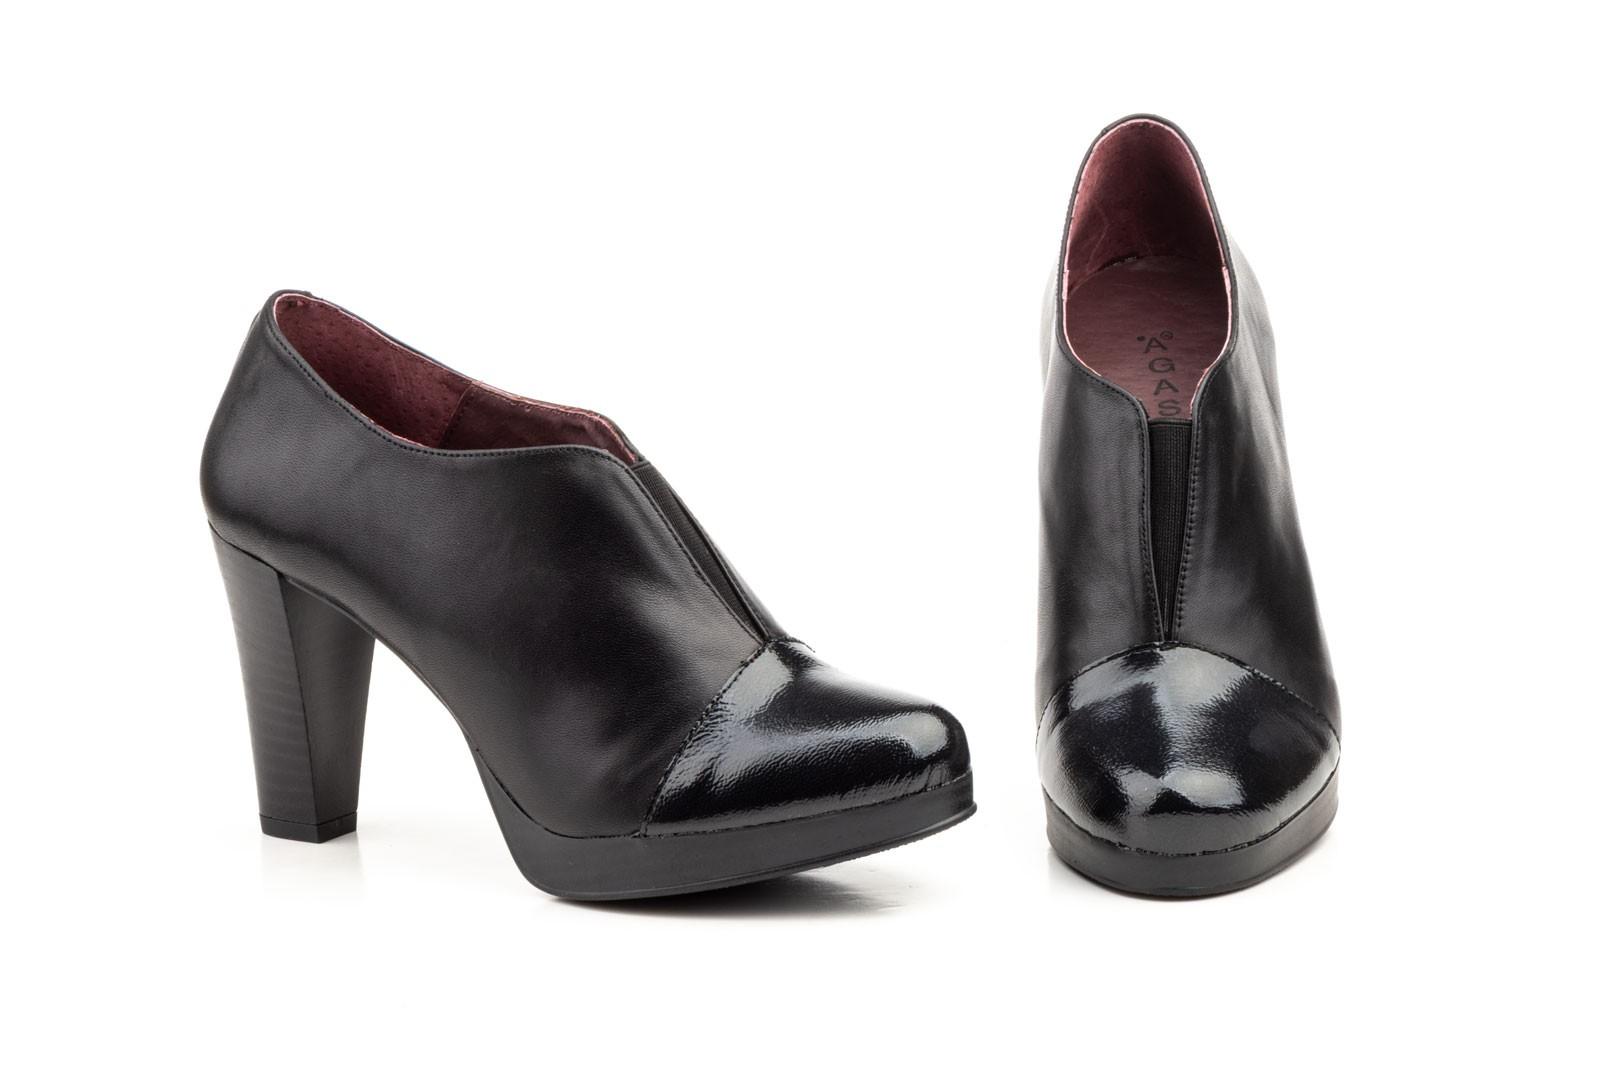 Shoes Seta Agatha Zapatos Mujer Negro Piel XRU68Uxwq